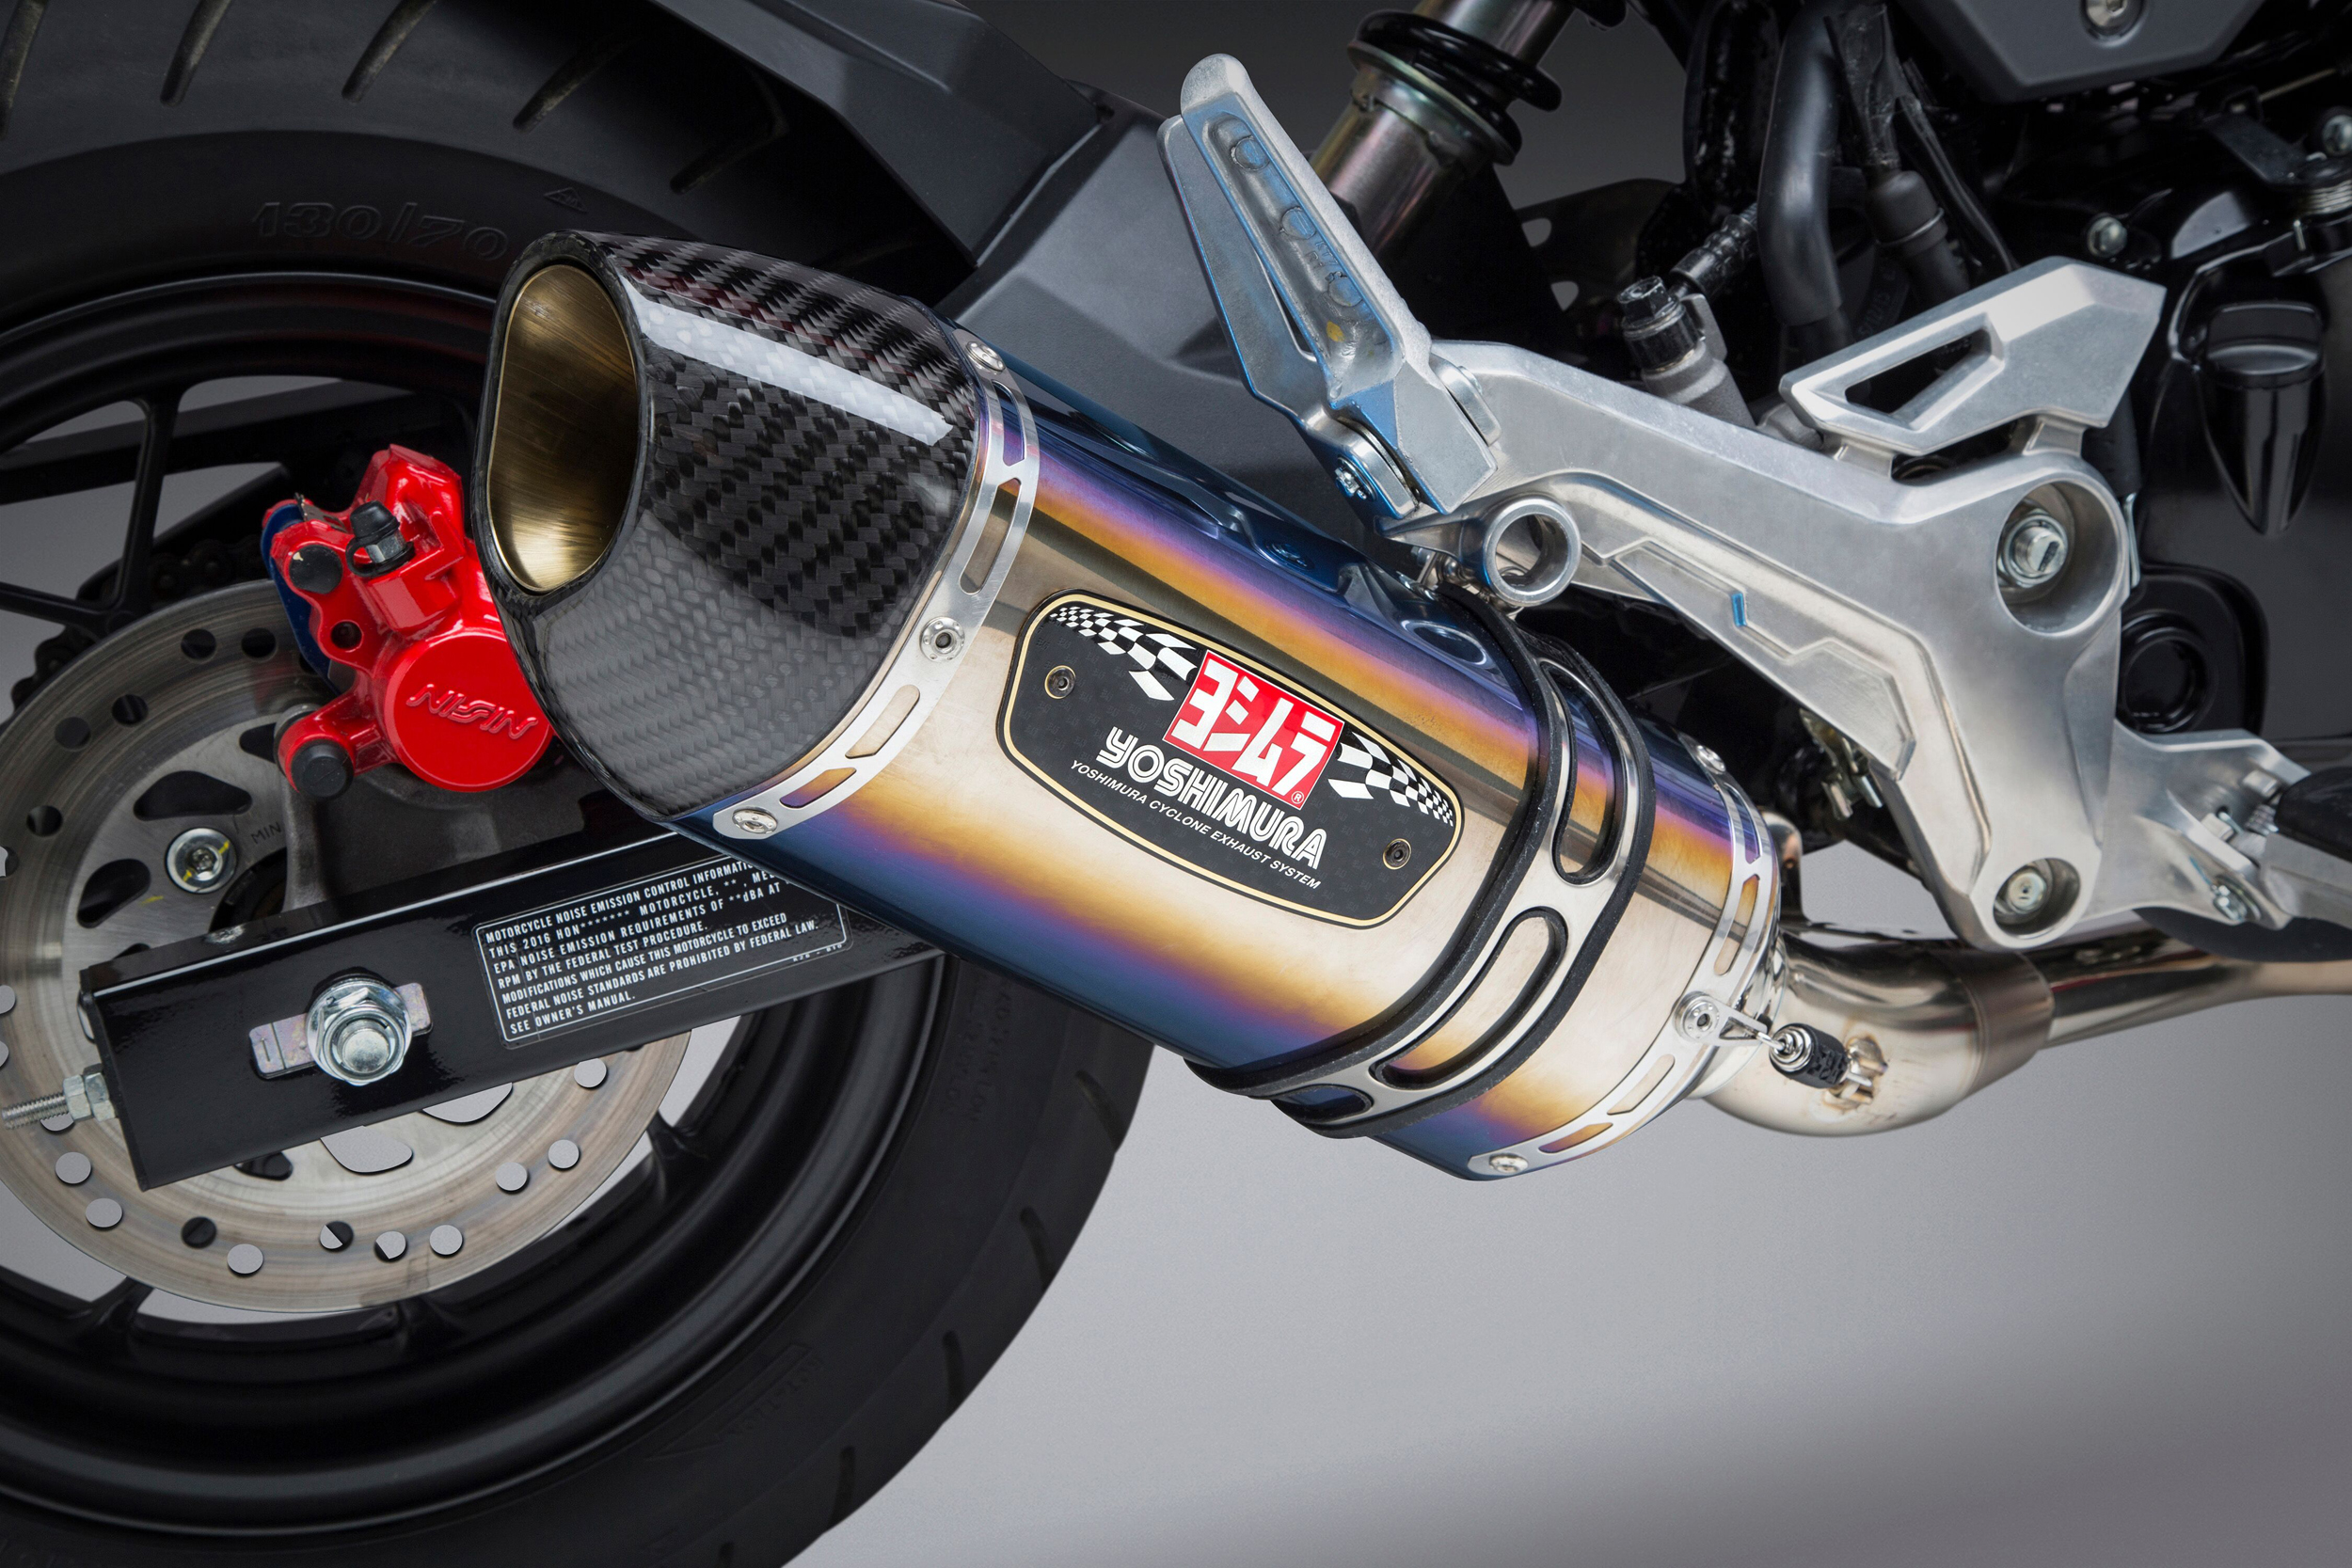 2019 Honda Grom with Yoshimura R-77 titanium Race Series system